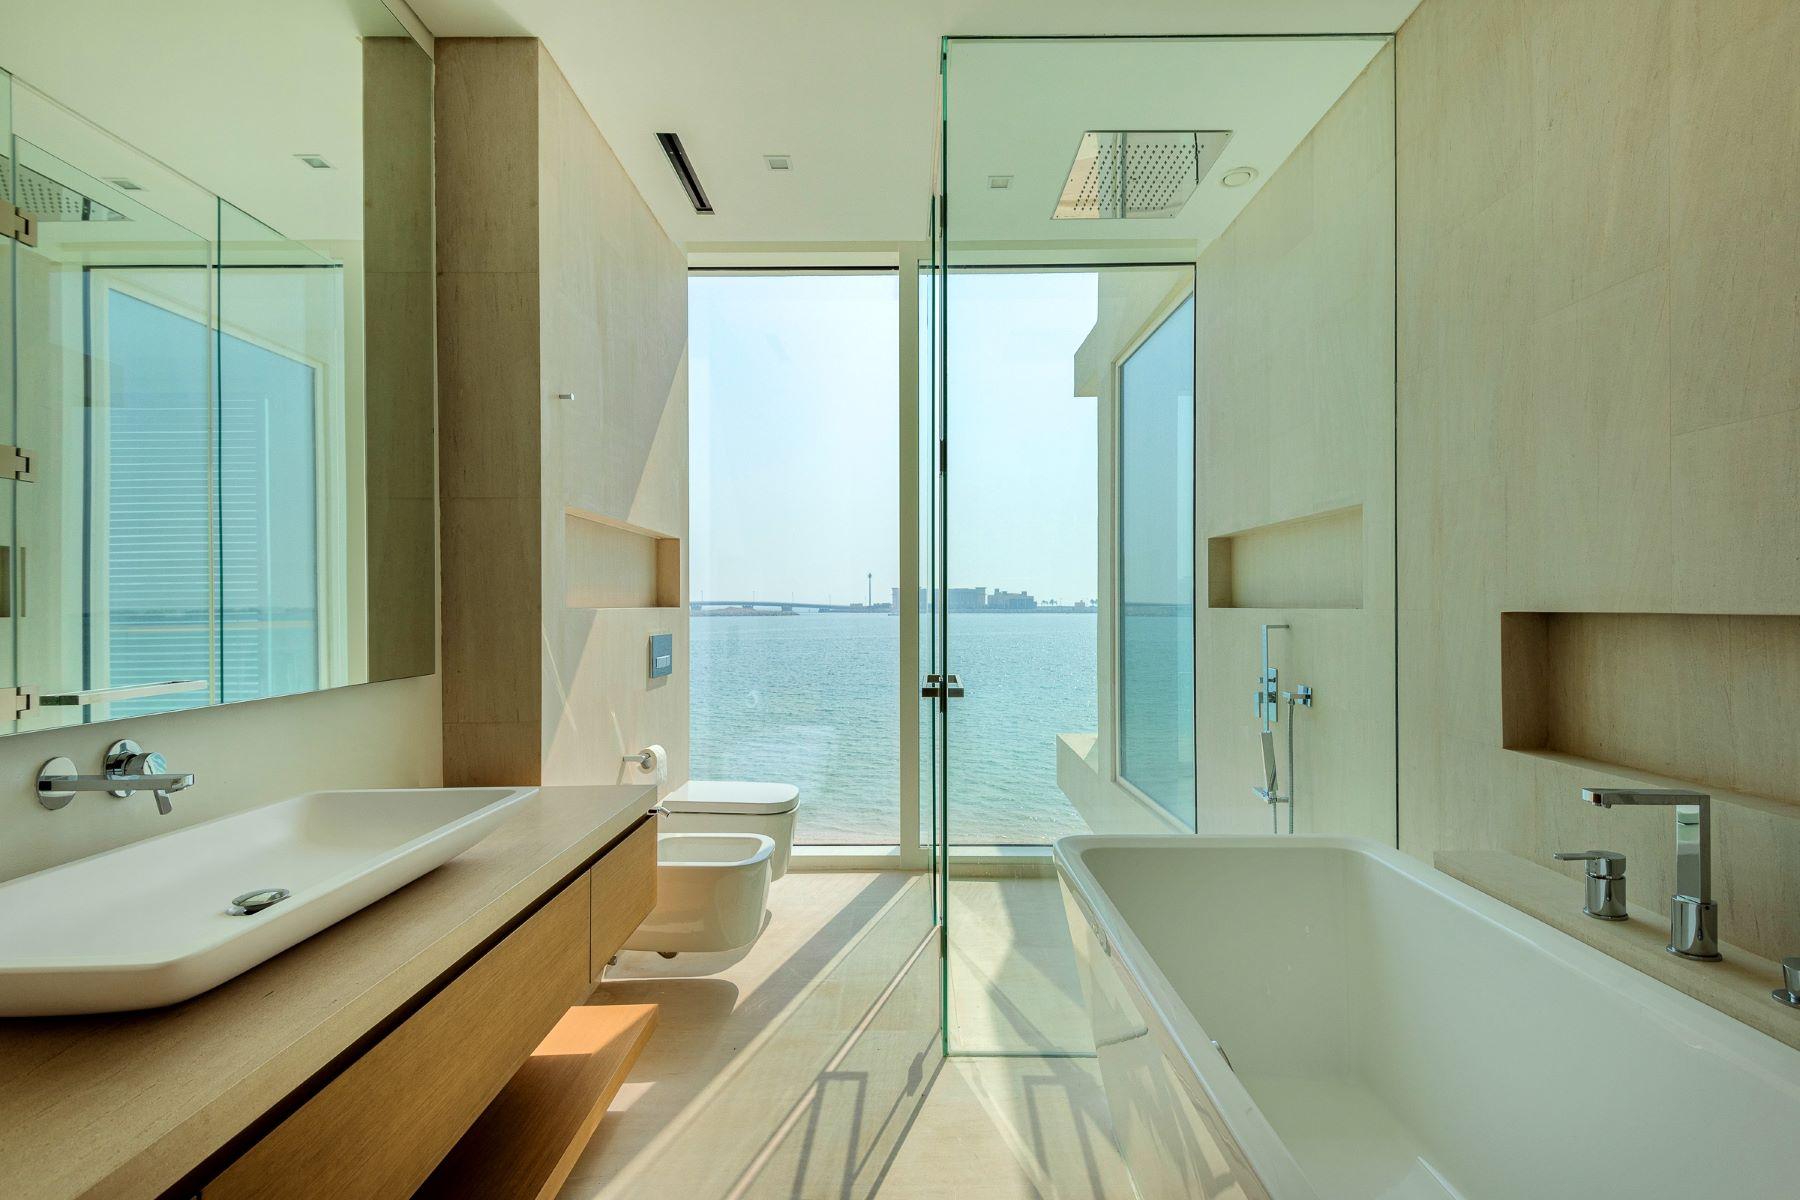 Additional photo for property listing at Brand New Modern Design Villa Signature Villas Palm Jumeirah Dubai, Dubai 12345 United Arab Emirates